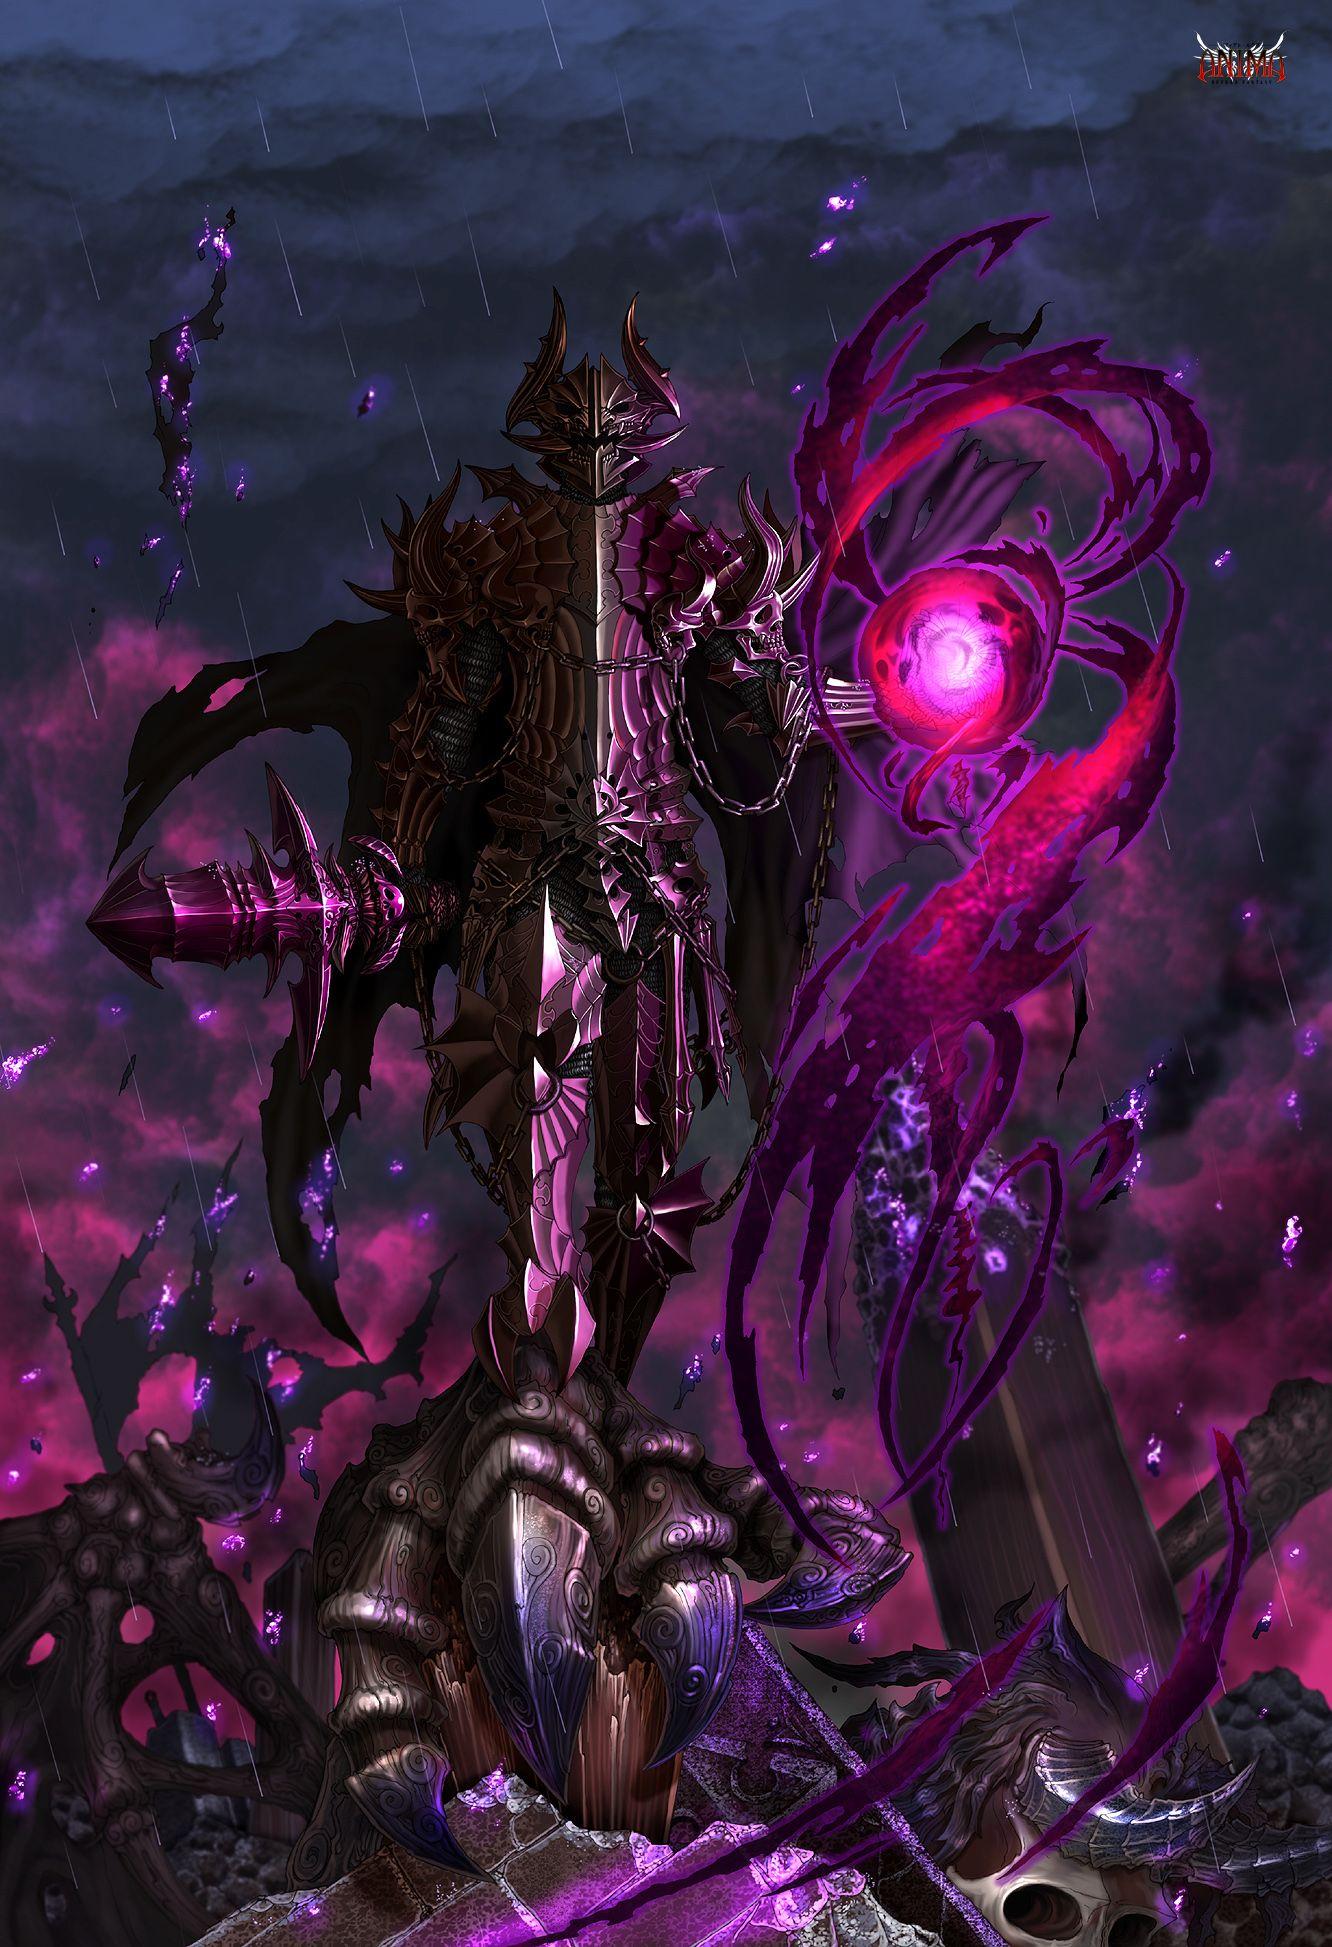 Anima: Alastor the Arbiter by Wen-M on DeviantArt